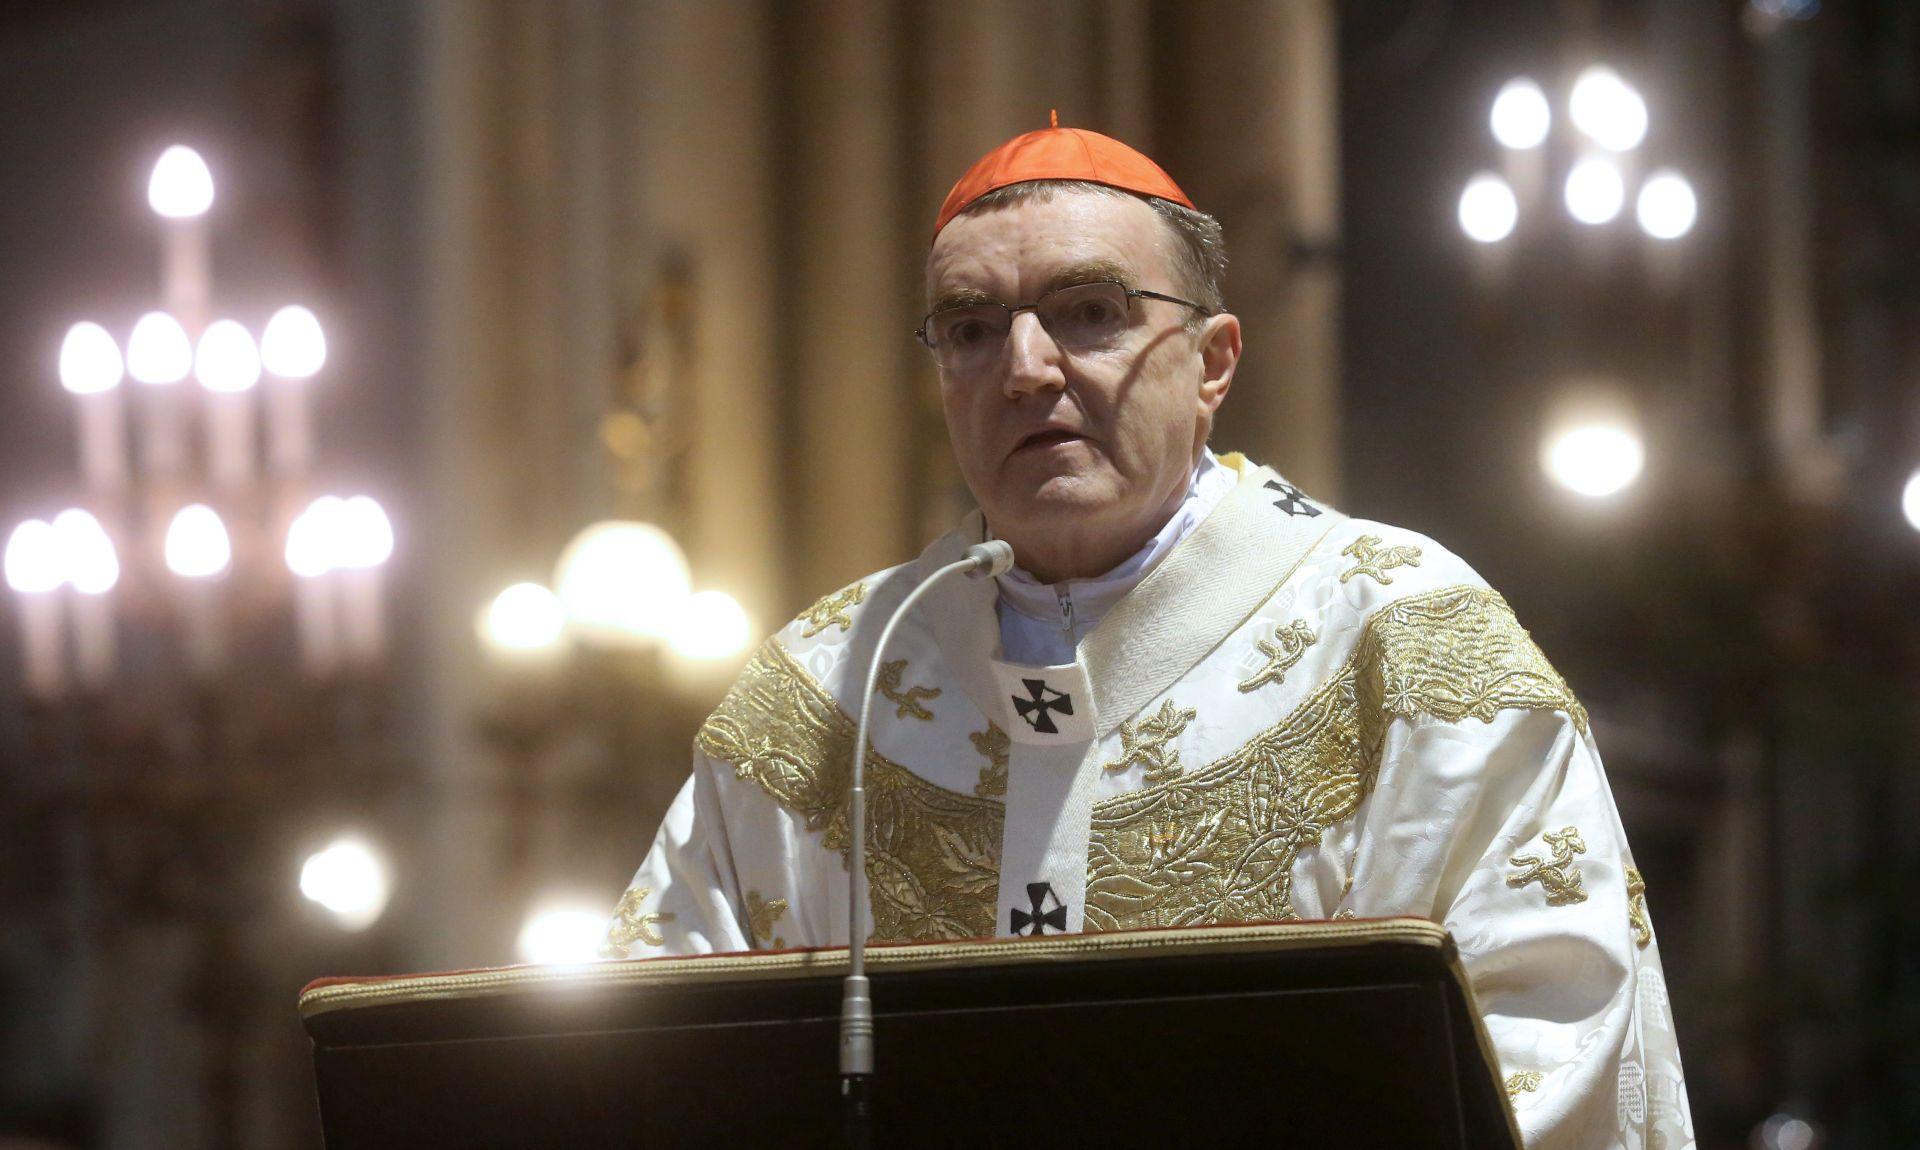 Papa Franjo smjenjuje Josipa Bozanića?